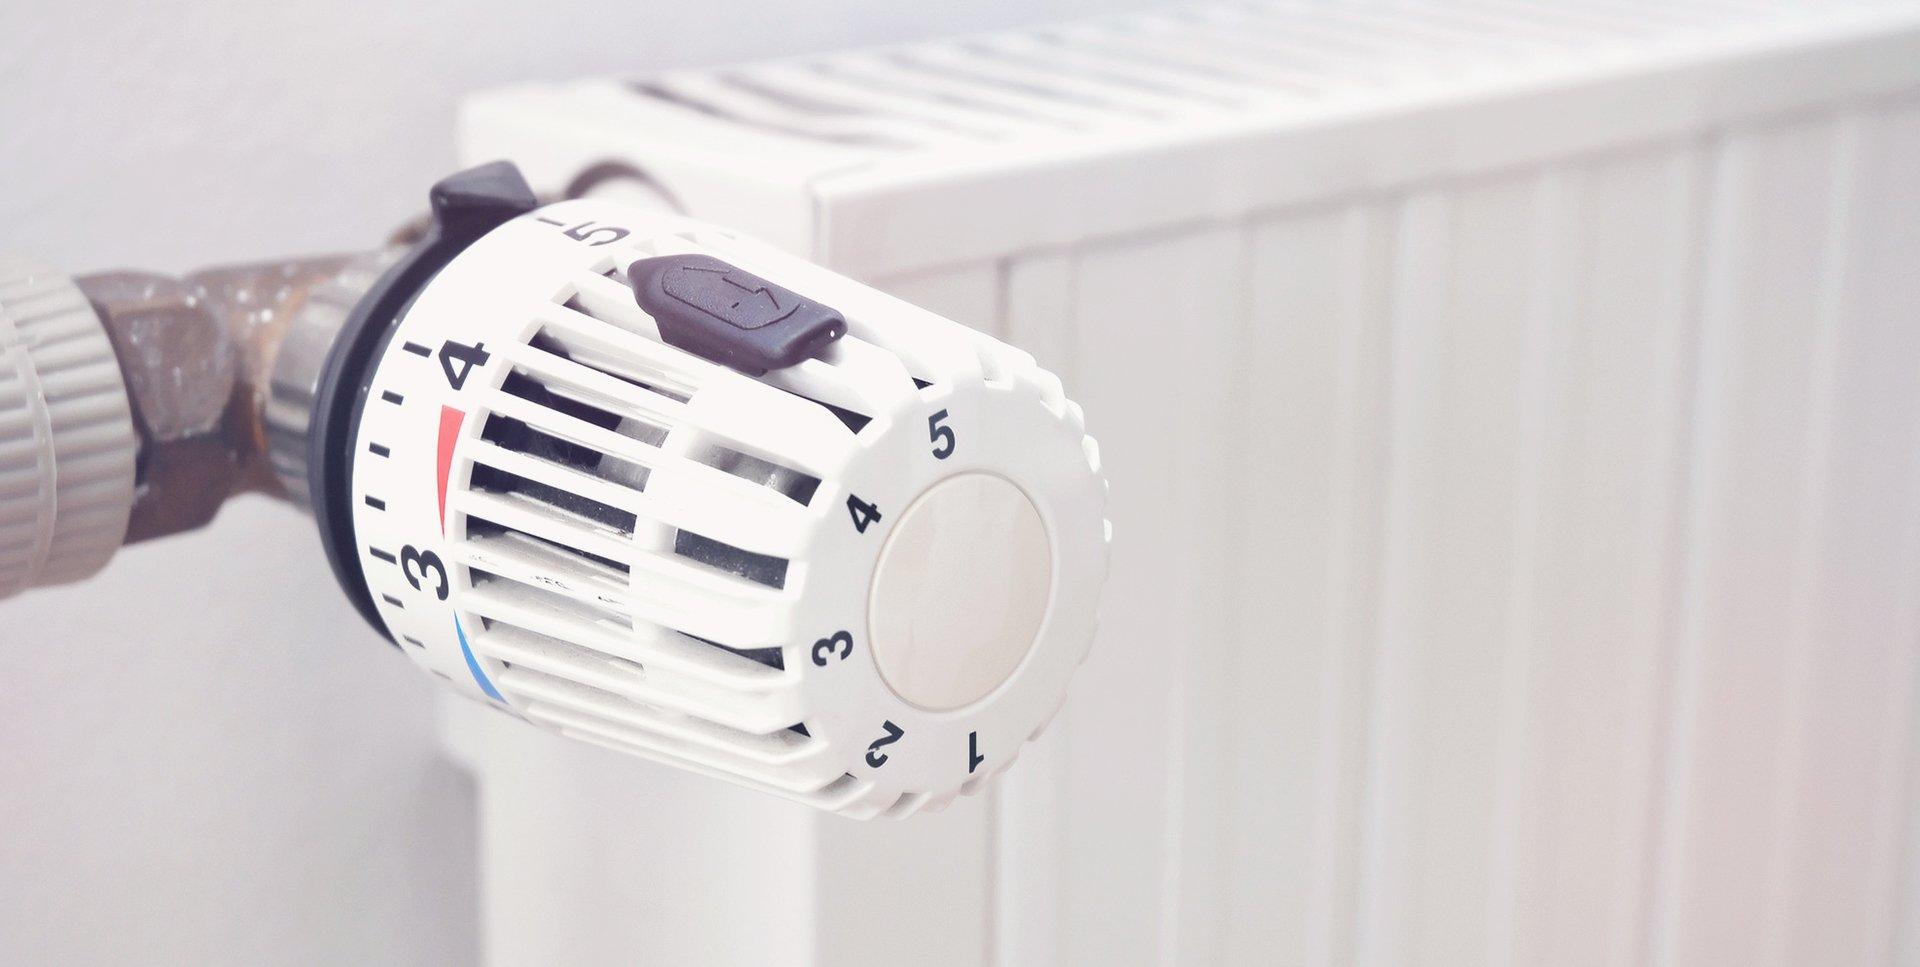 central heating system nob